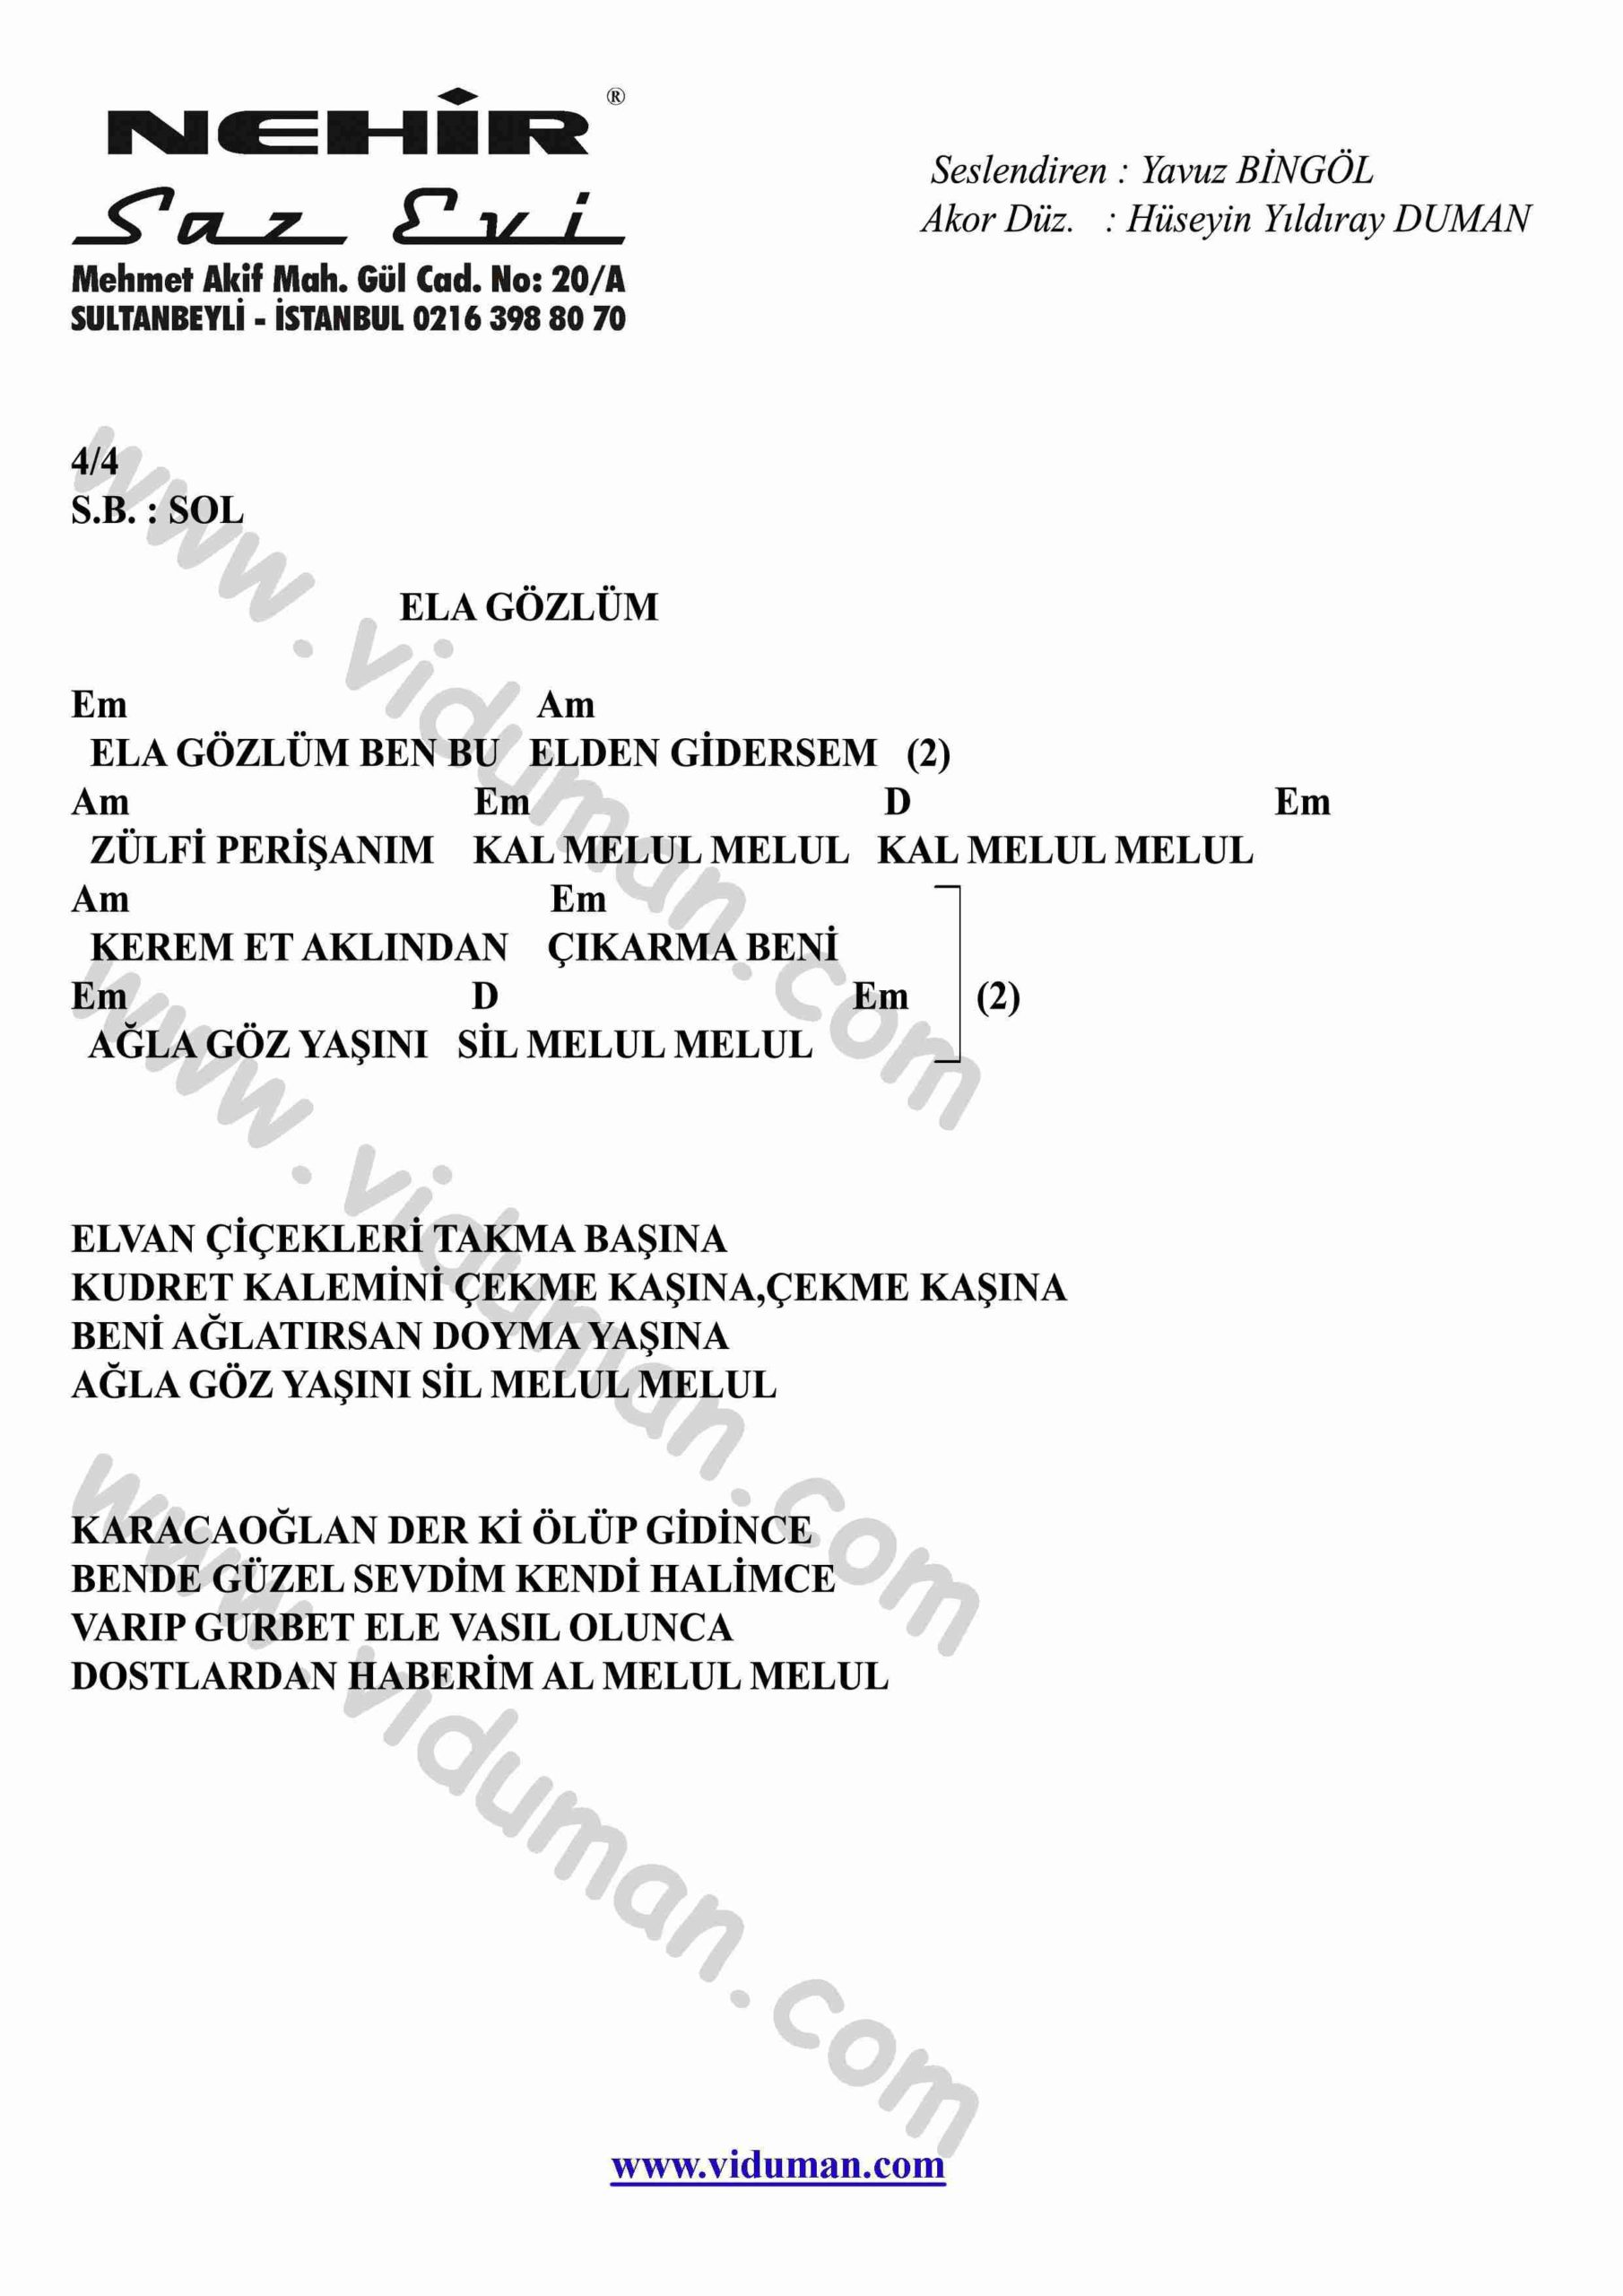 Ela Gozlum-Gitar-Ritim-Akorlari